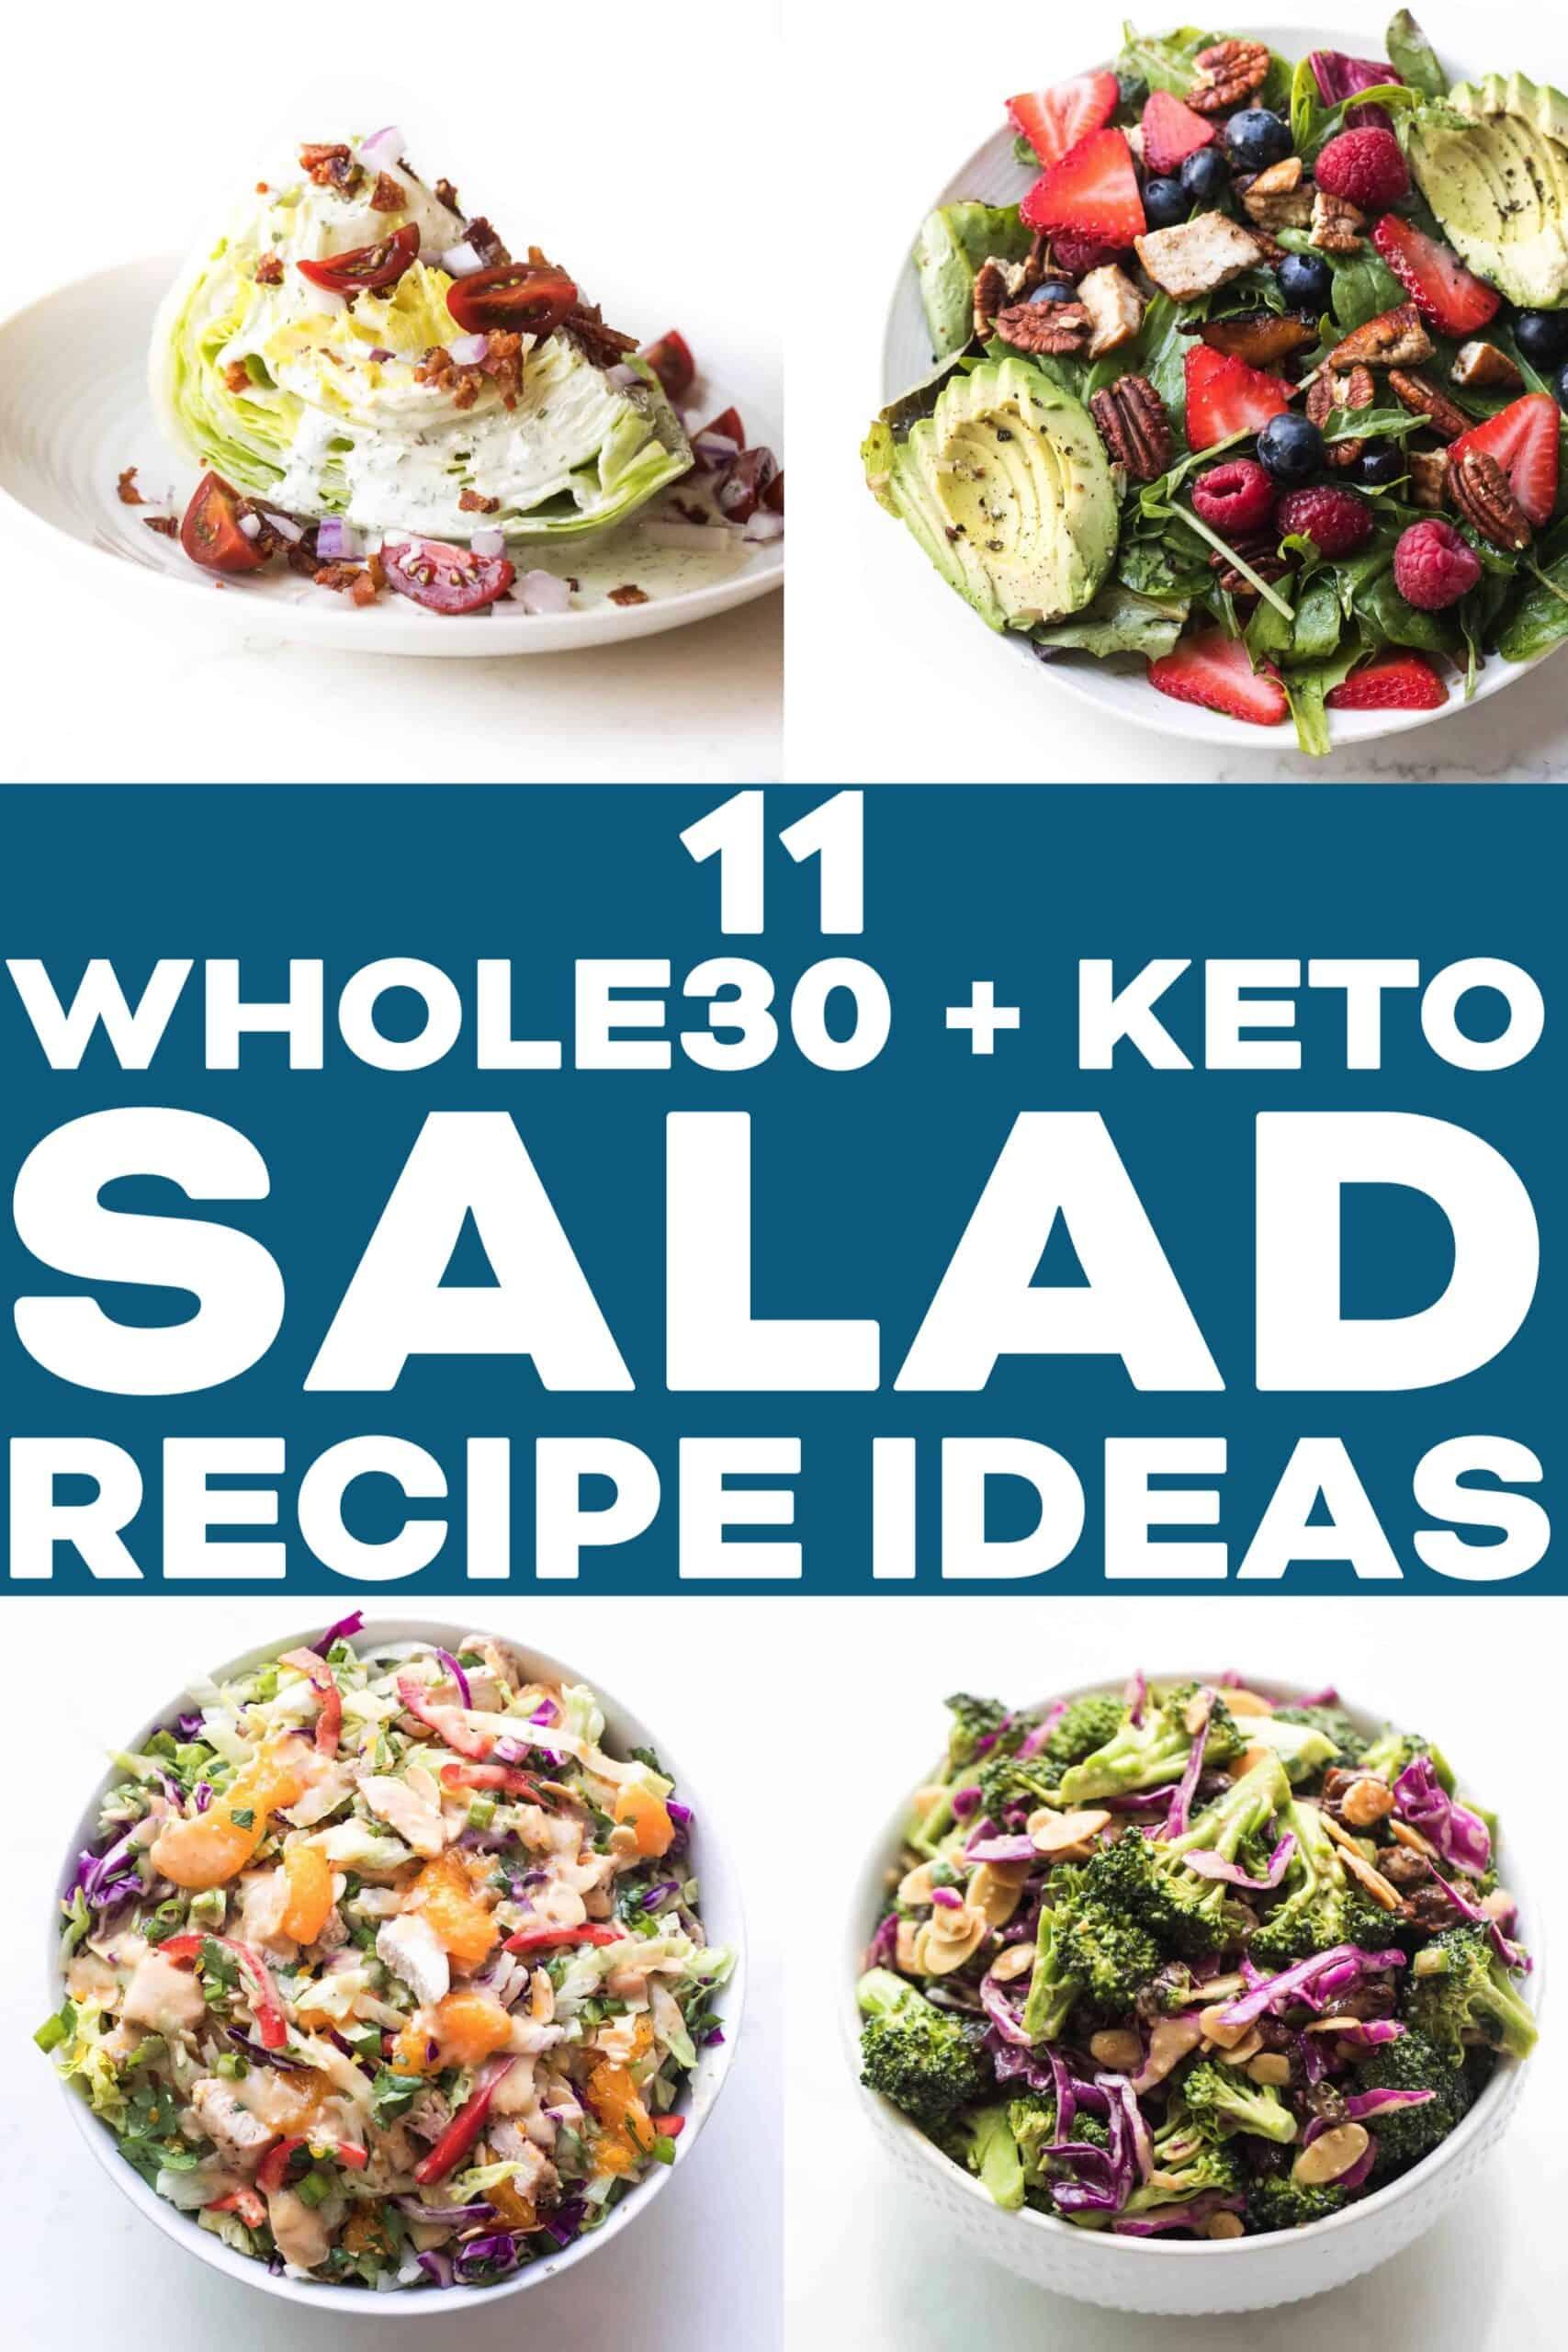 WHOLE30 KETO SALAD RECIPES